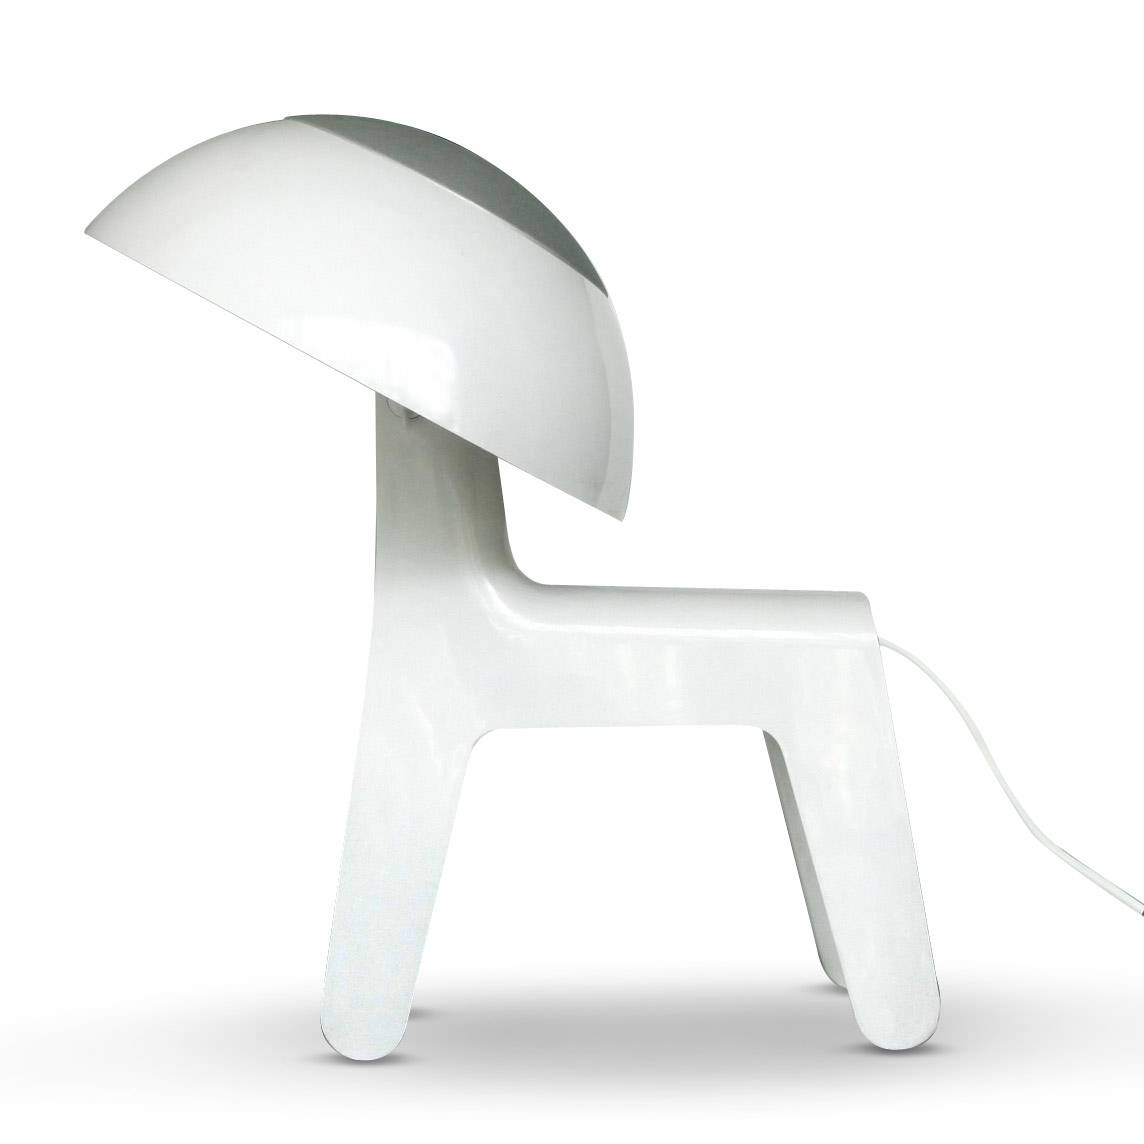 Image of   Bord-/Gulvlampe - Dog Lamp (Hvid)